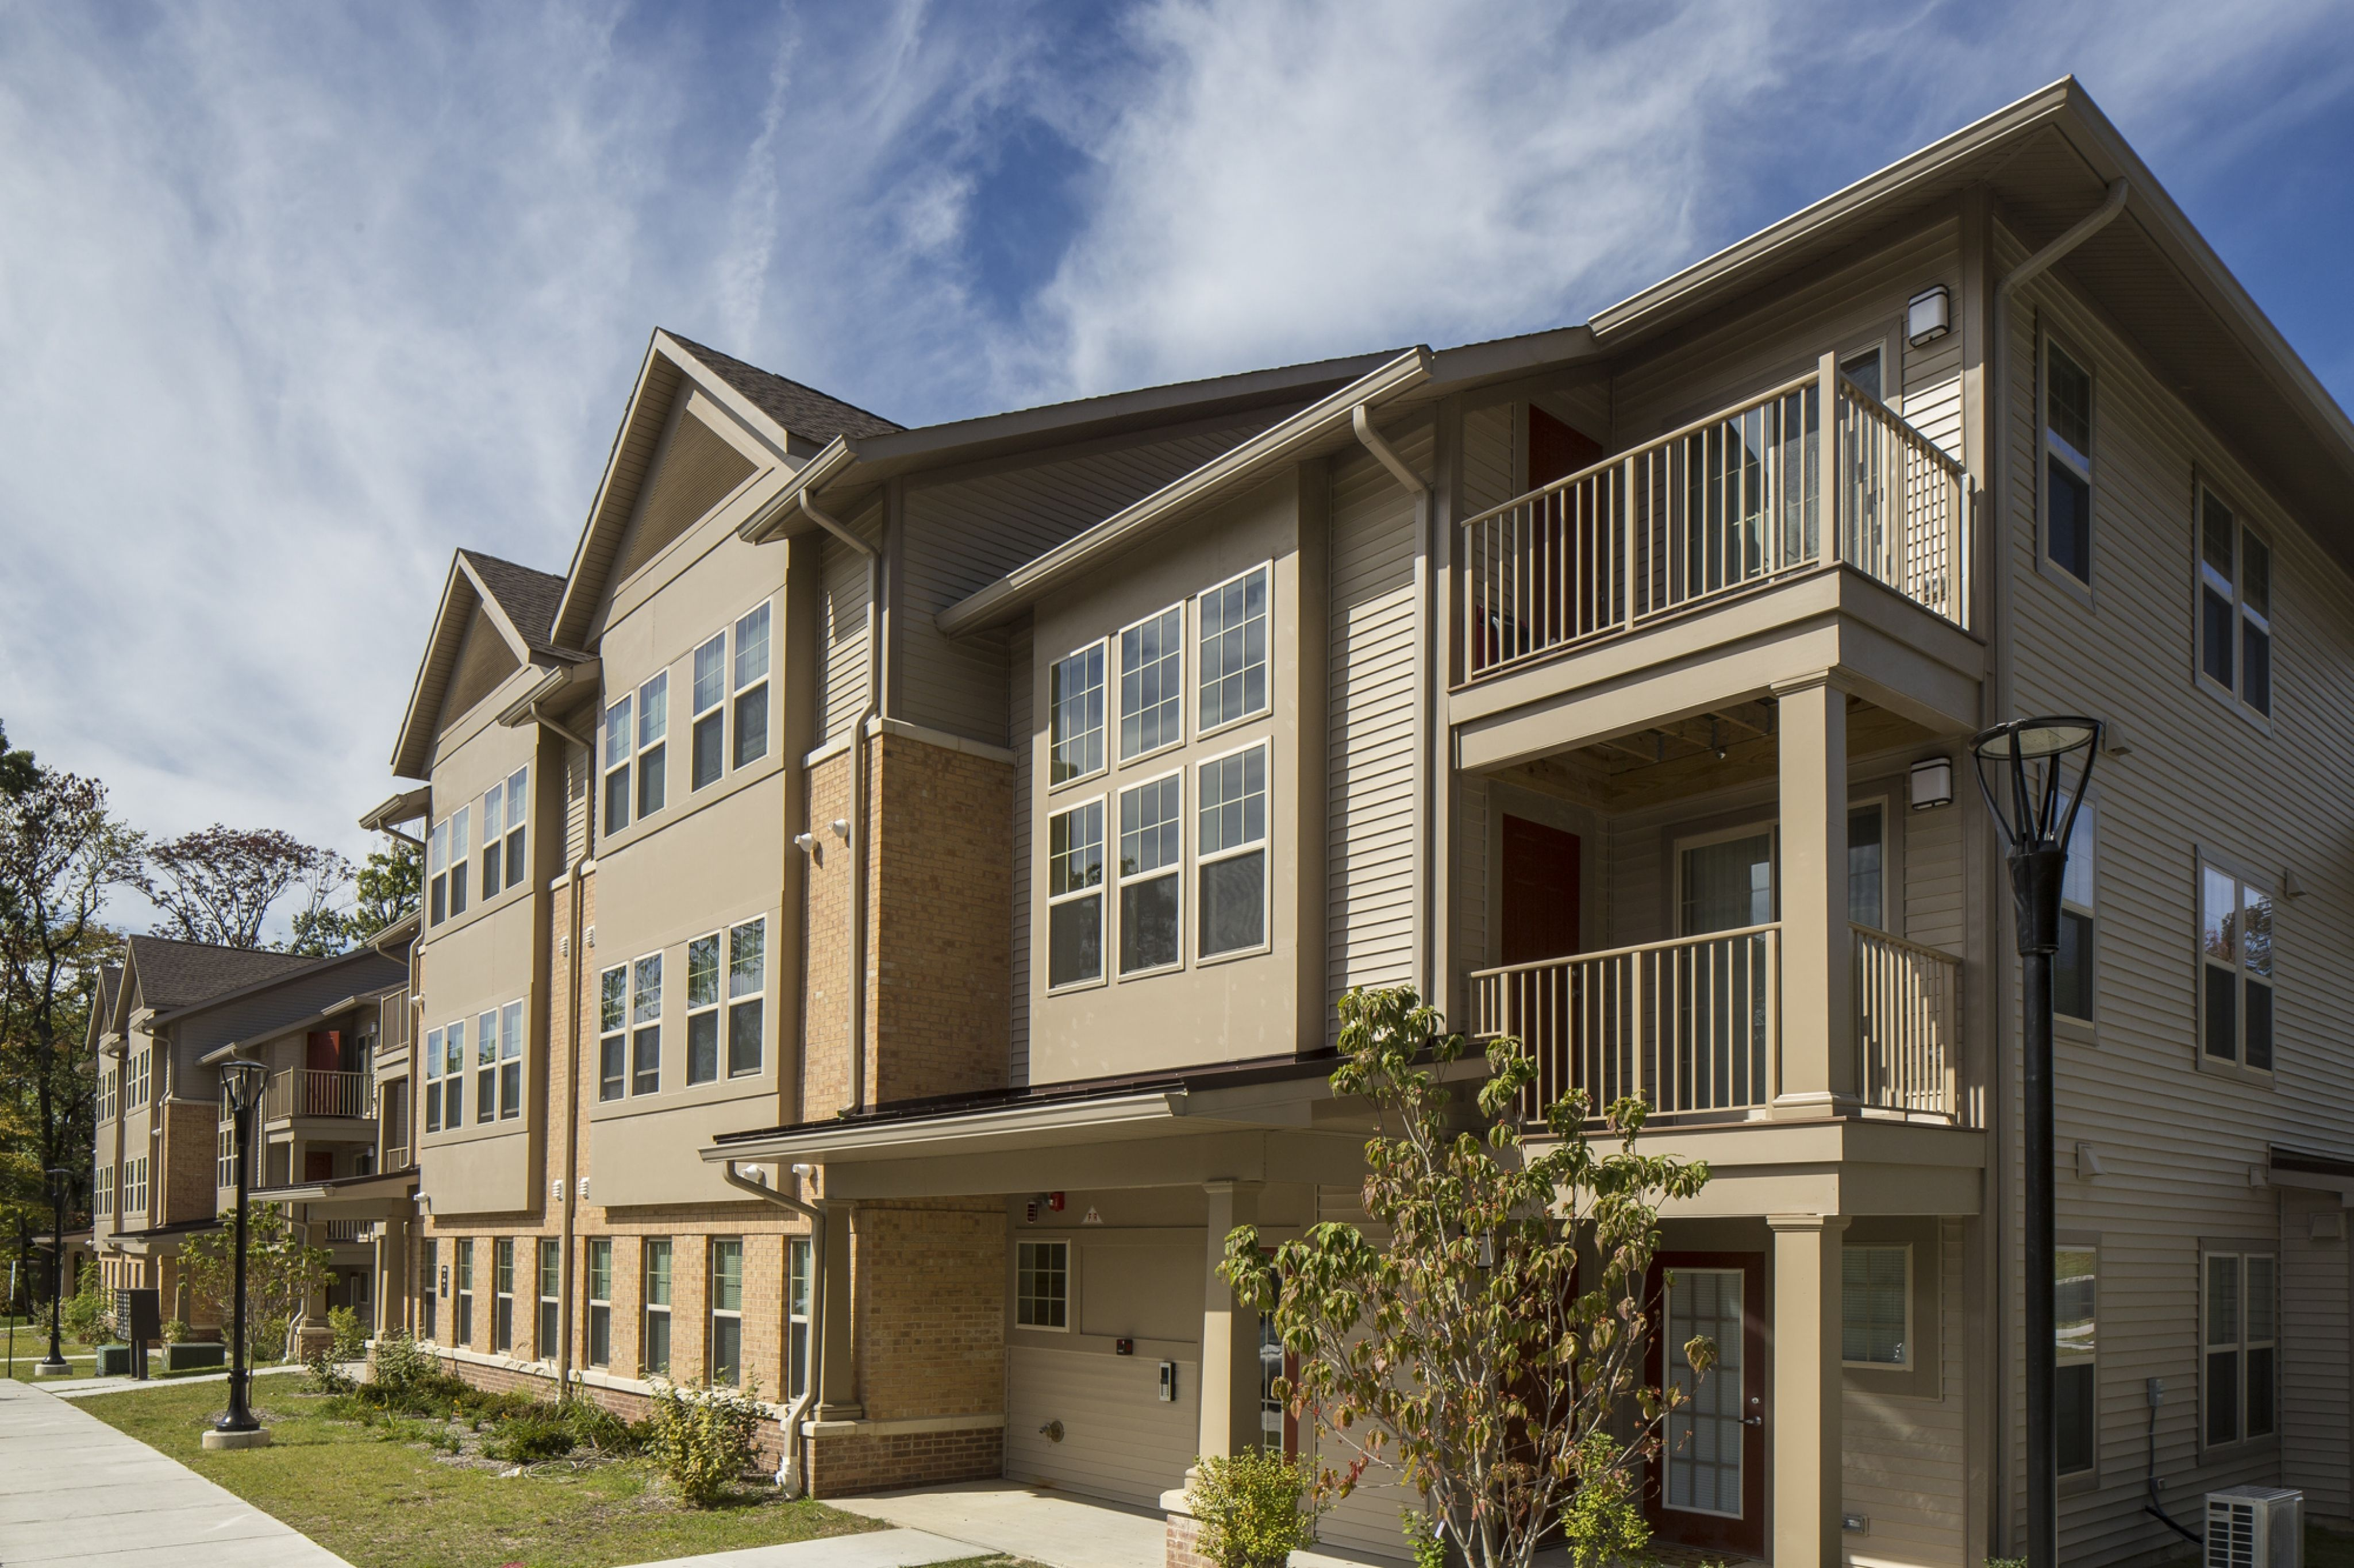 Butler Ridge Apartments Nj - interior paint colors 2017 Check more ...